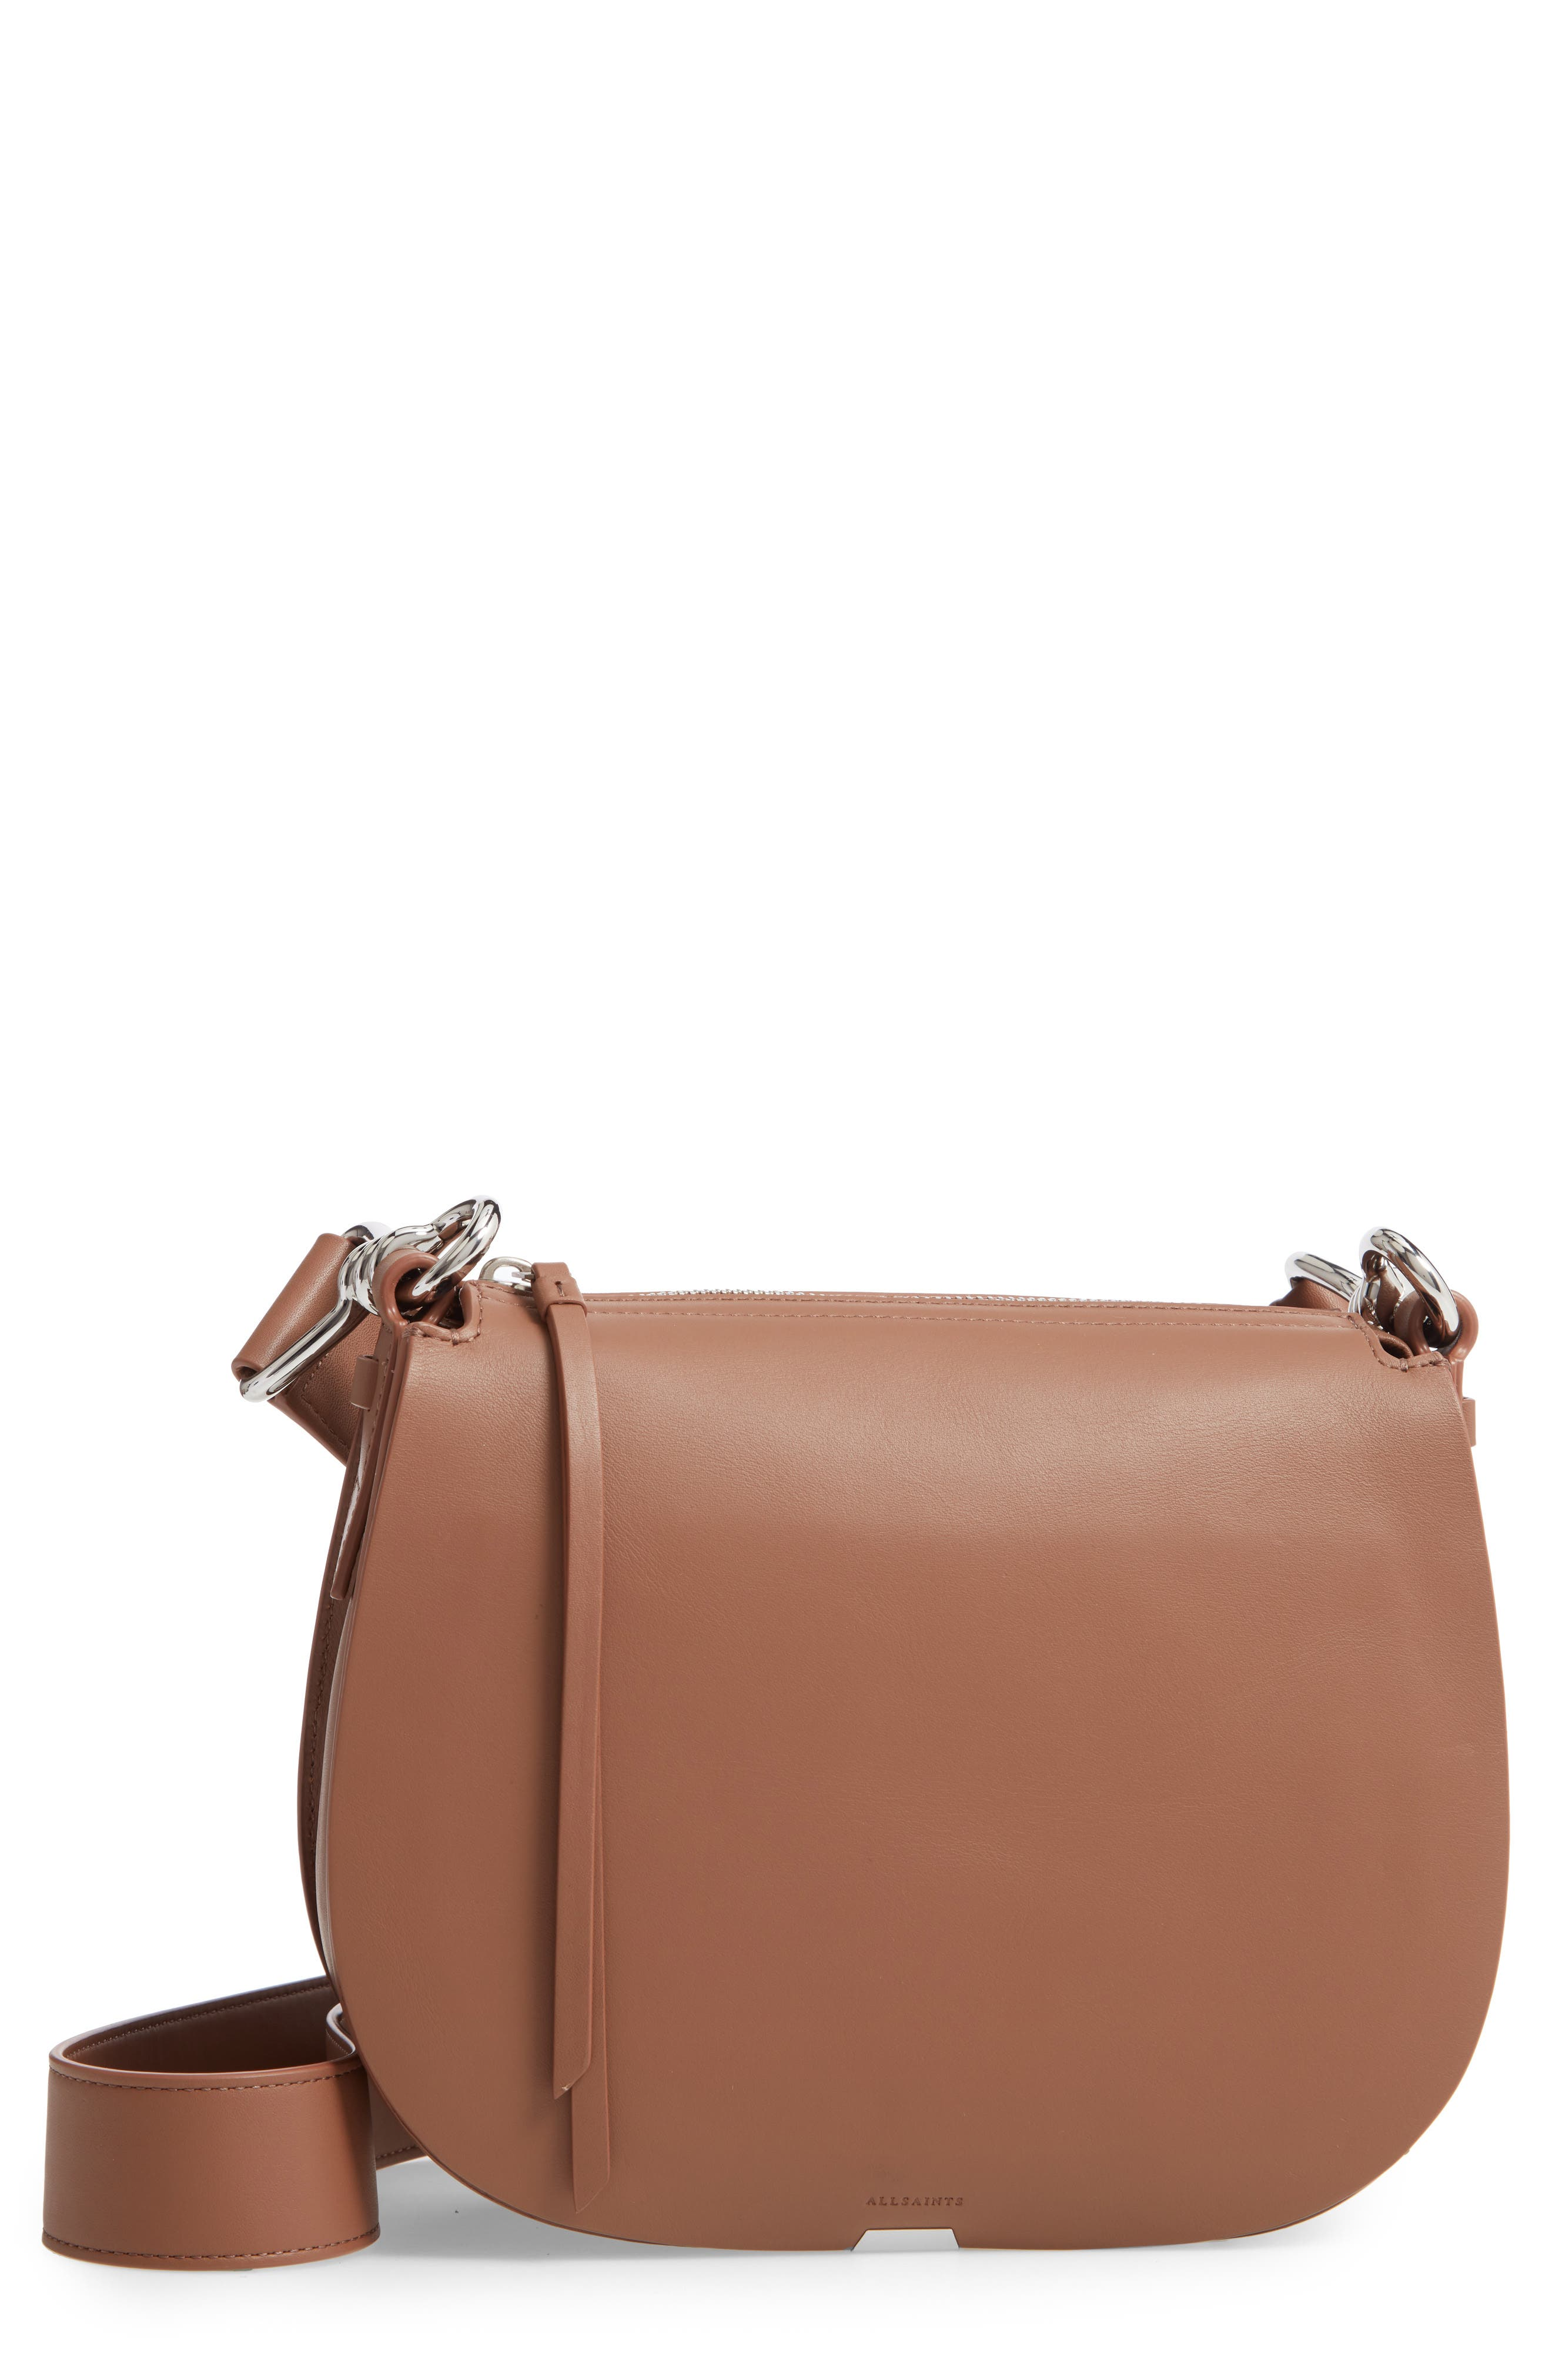 ALLSAINTS Captain Round Leather Crossbody Bag, Main, color, MILK CHOCOLATE